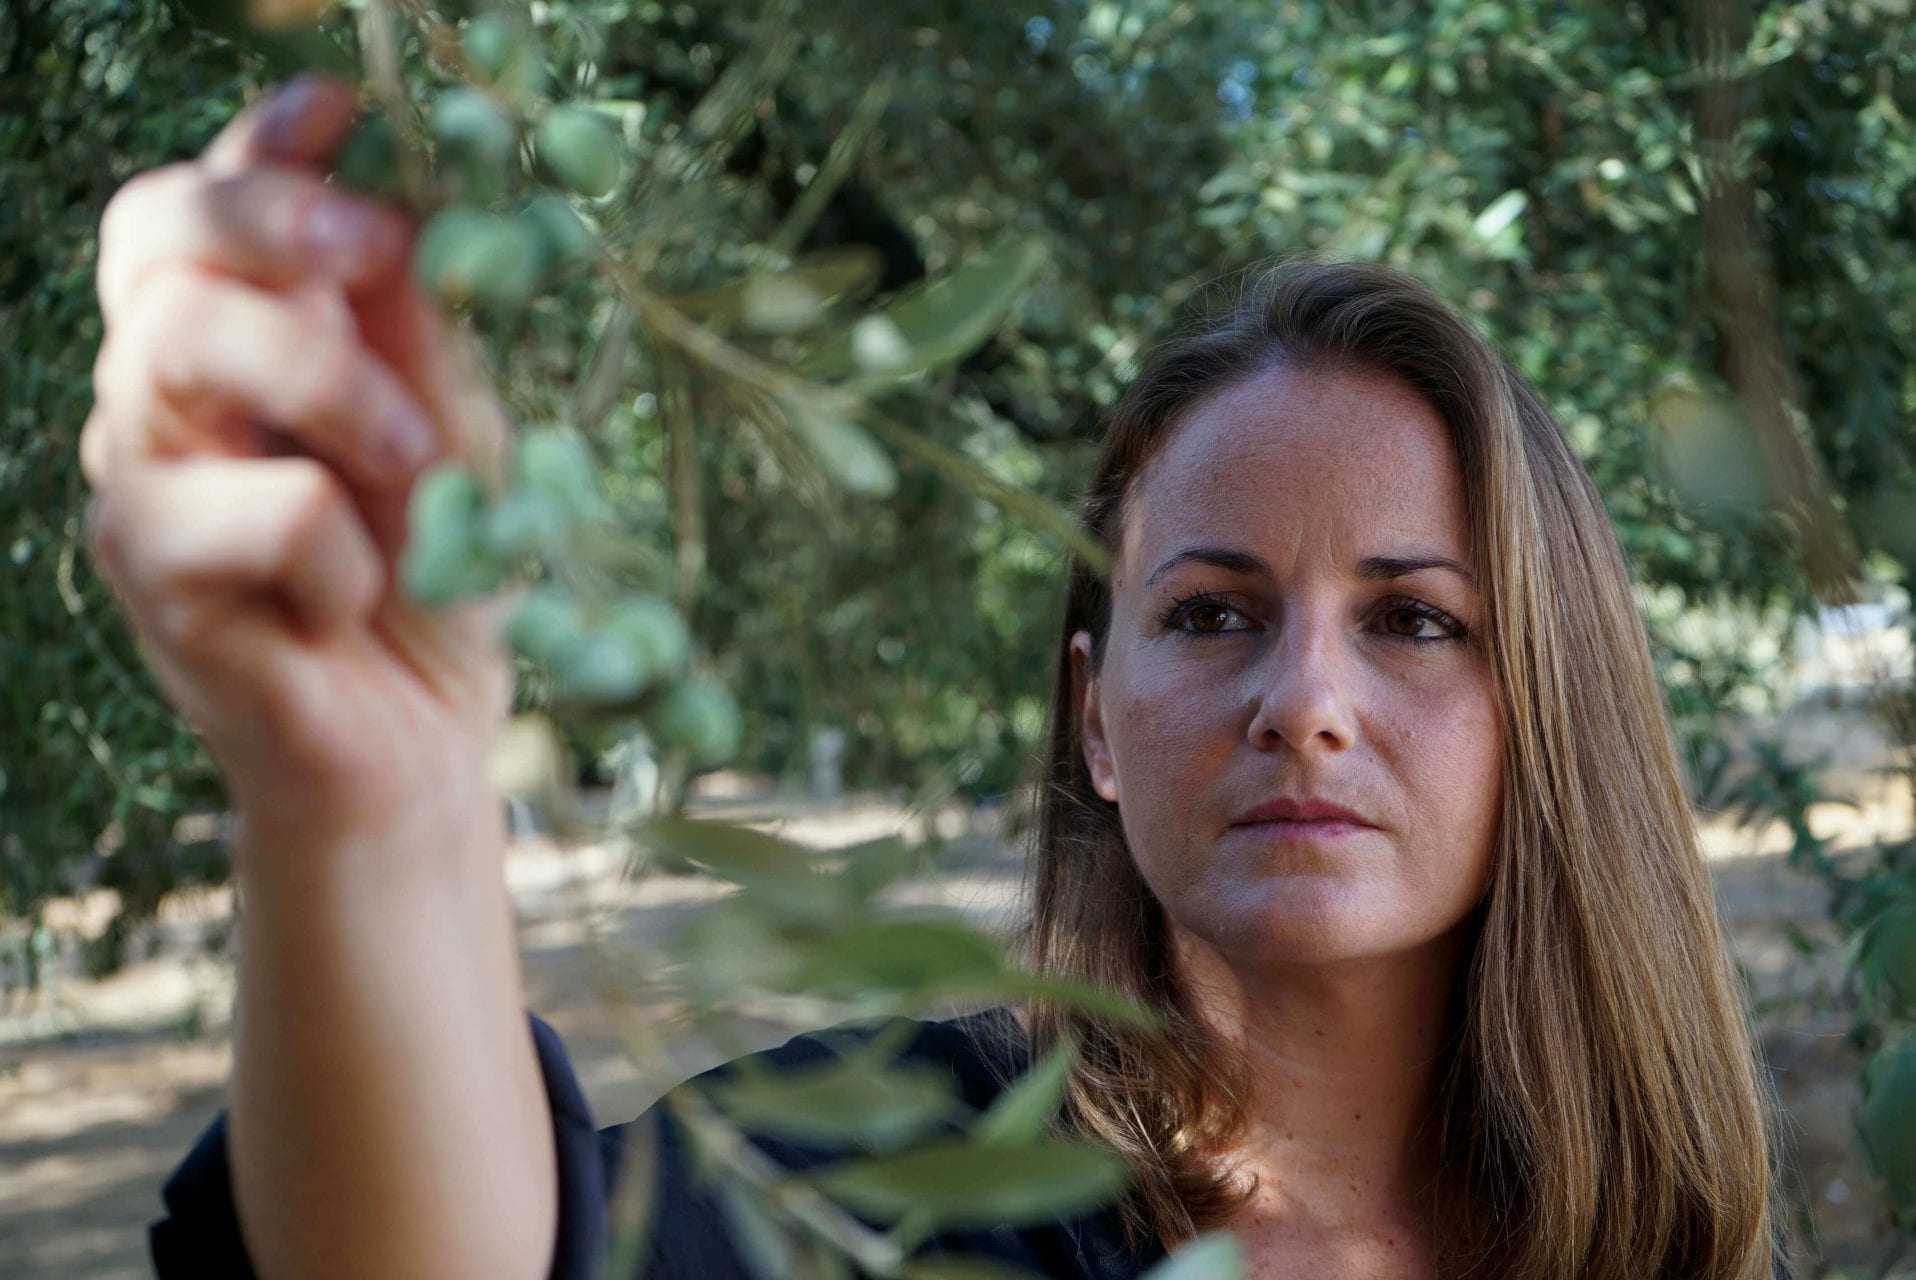 at-hacienda-guzman-promoting-olive-culture-by-celebrating-its-diversity